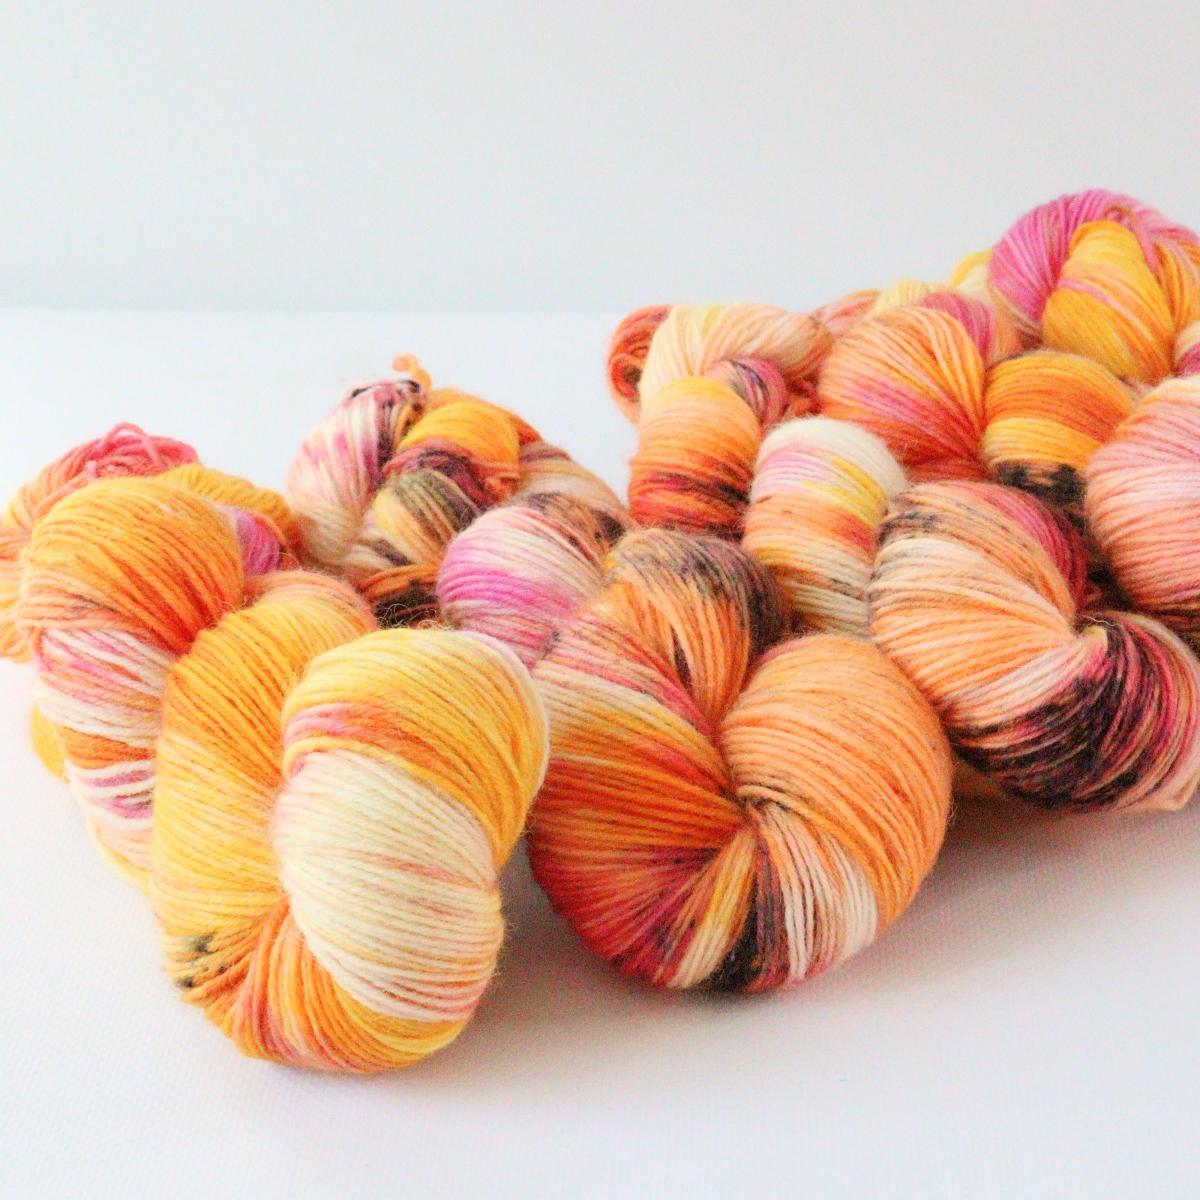 woodico.pro hand dyed yarn 083 2 1200x1200 - Hand dyed yarn / 083